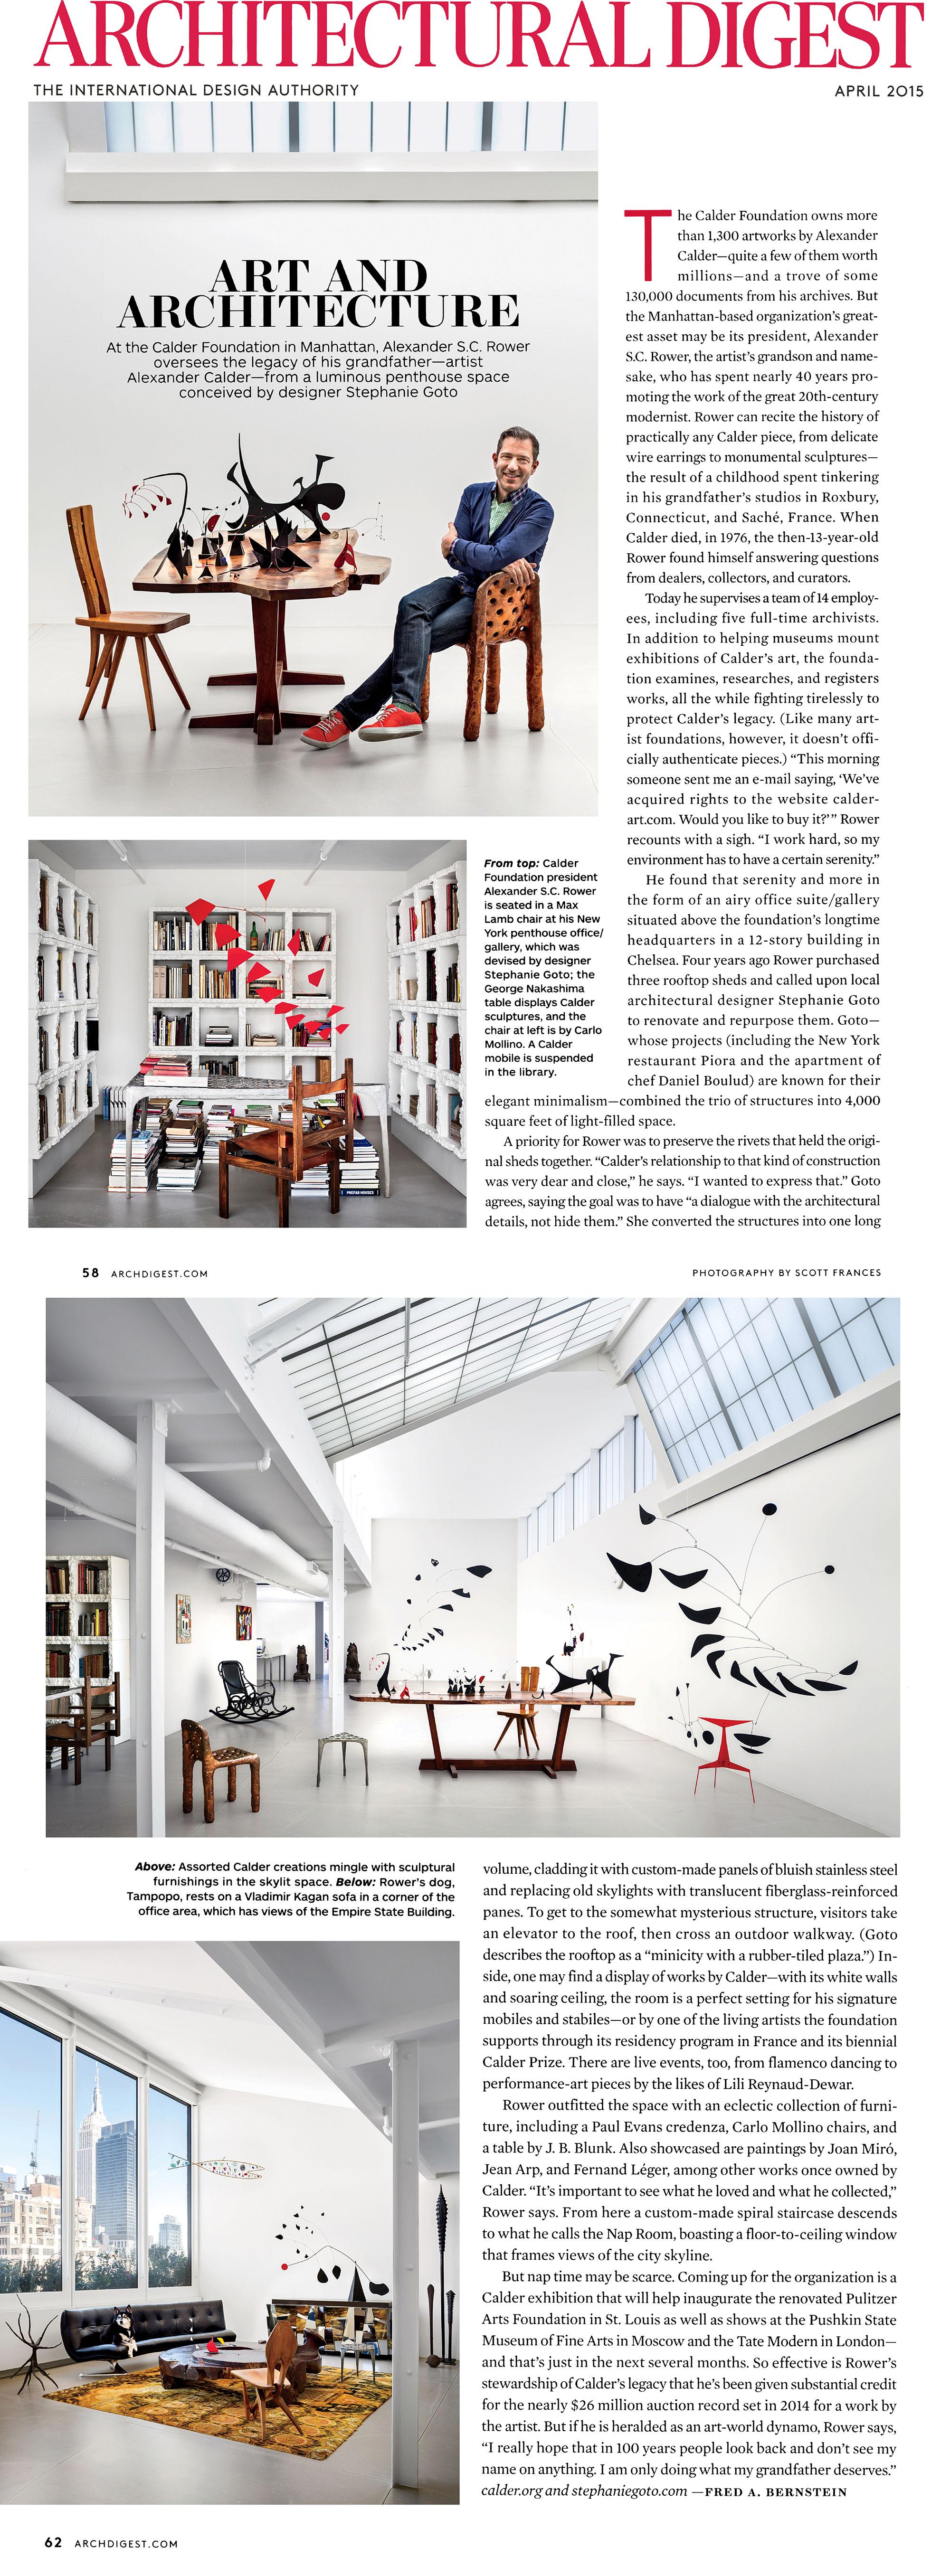 6-2015-04-PH-Architectual-Digest.jpg